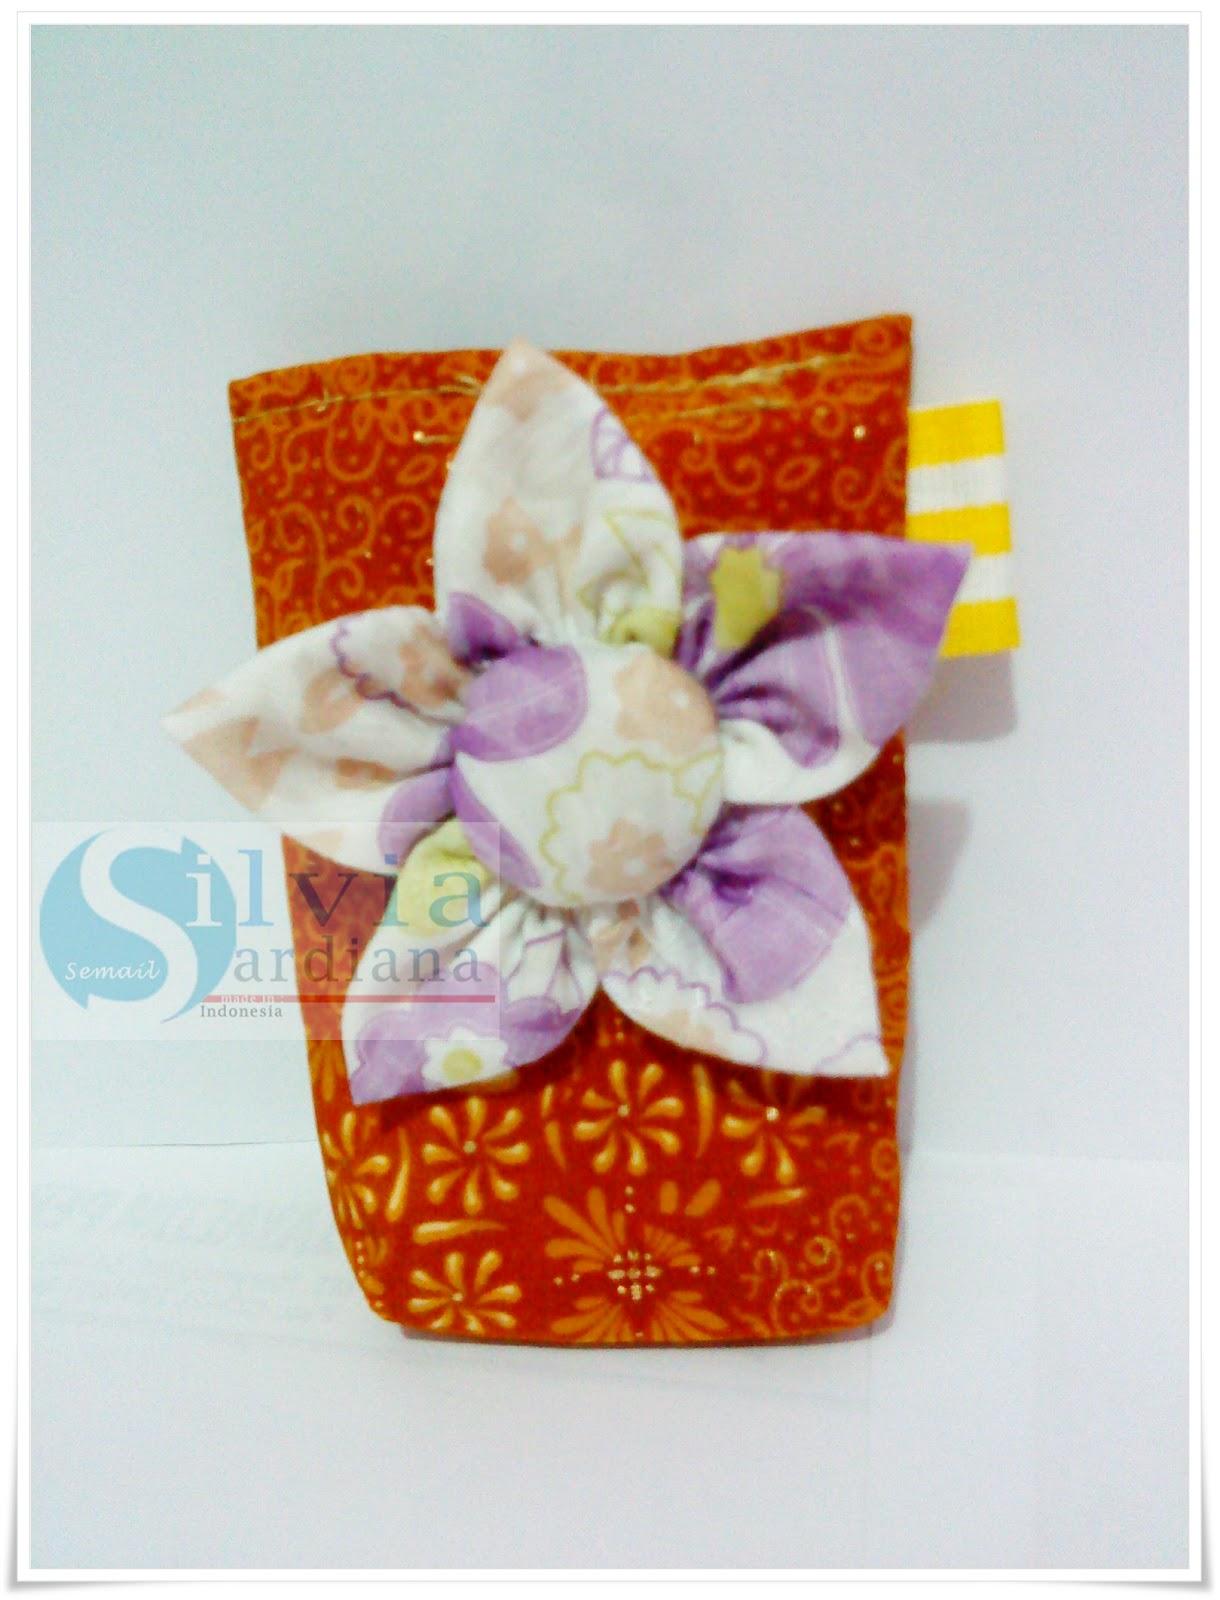 membuat bunga yoyo dari kain perca, nah cara buat dan bentuk dari